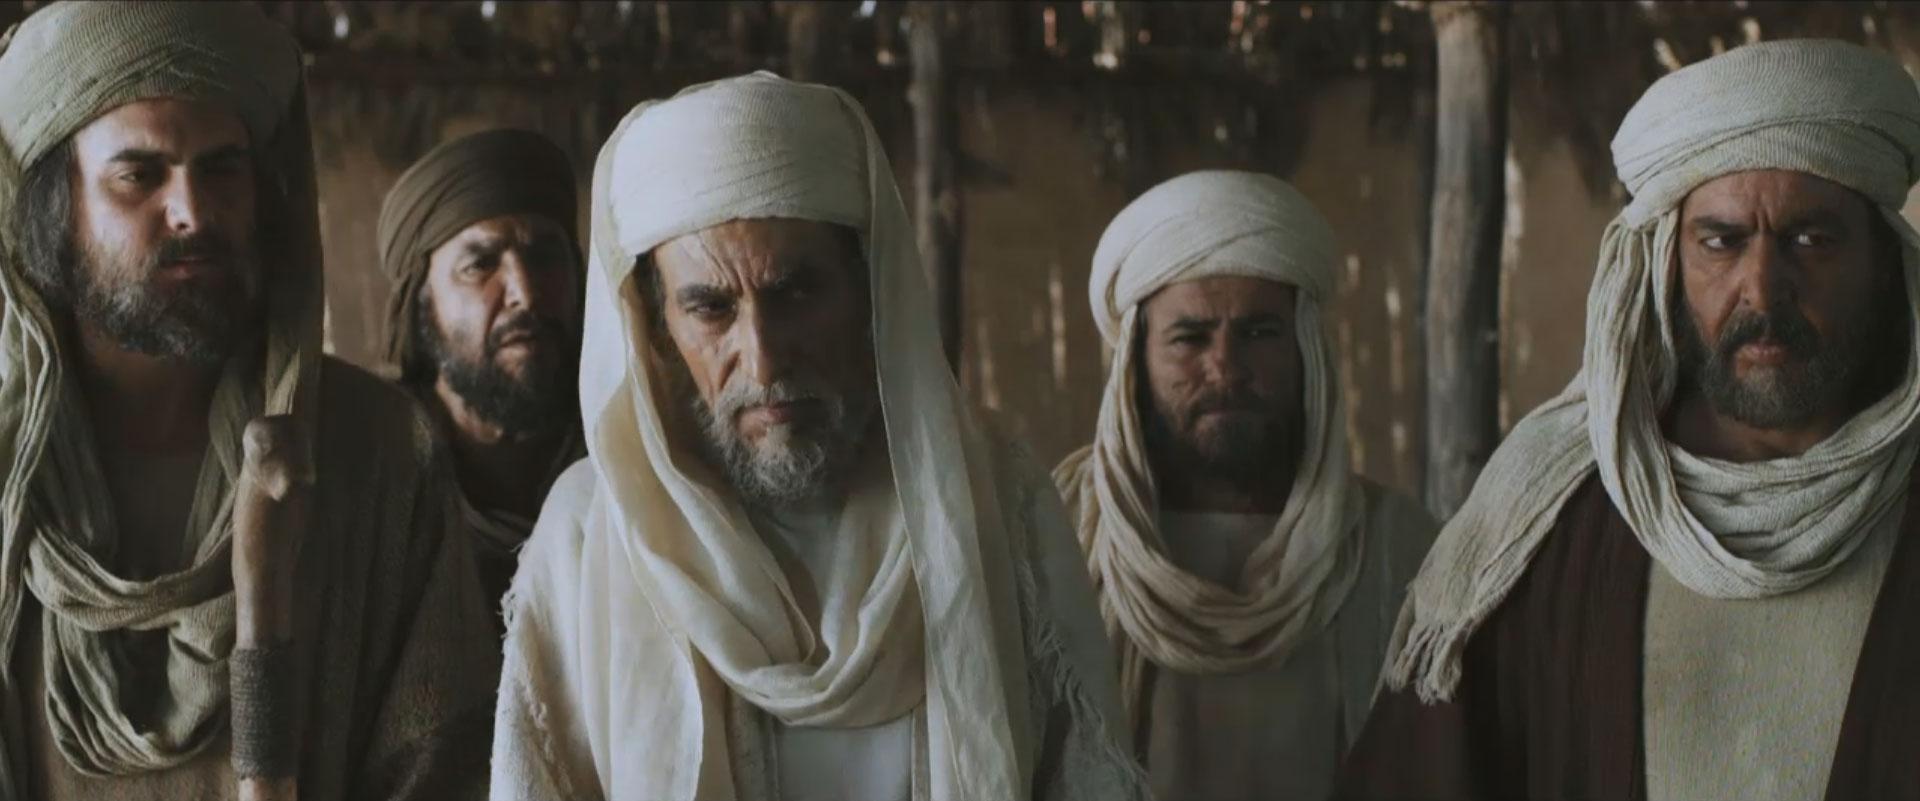 Omar Ibn Khattab Episode 19